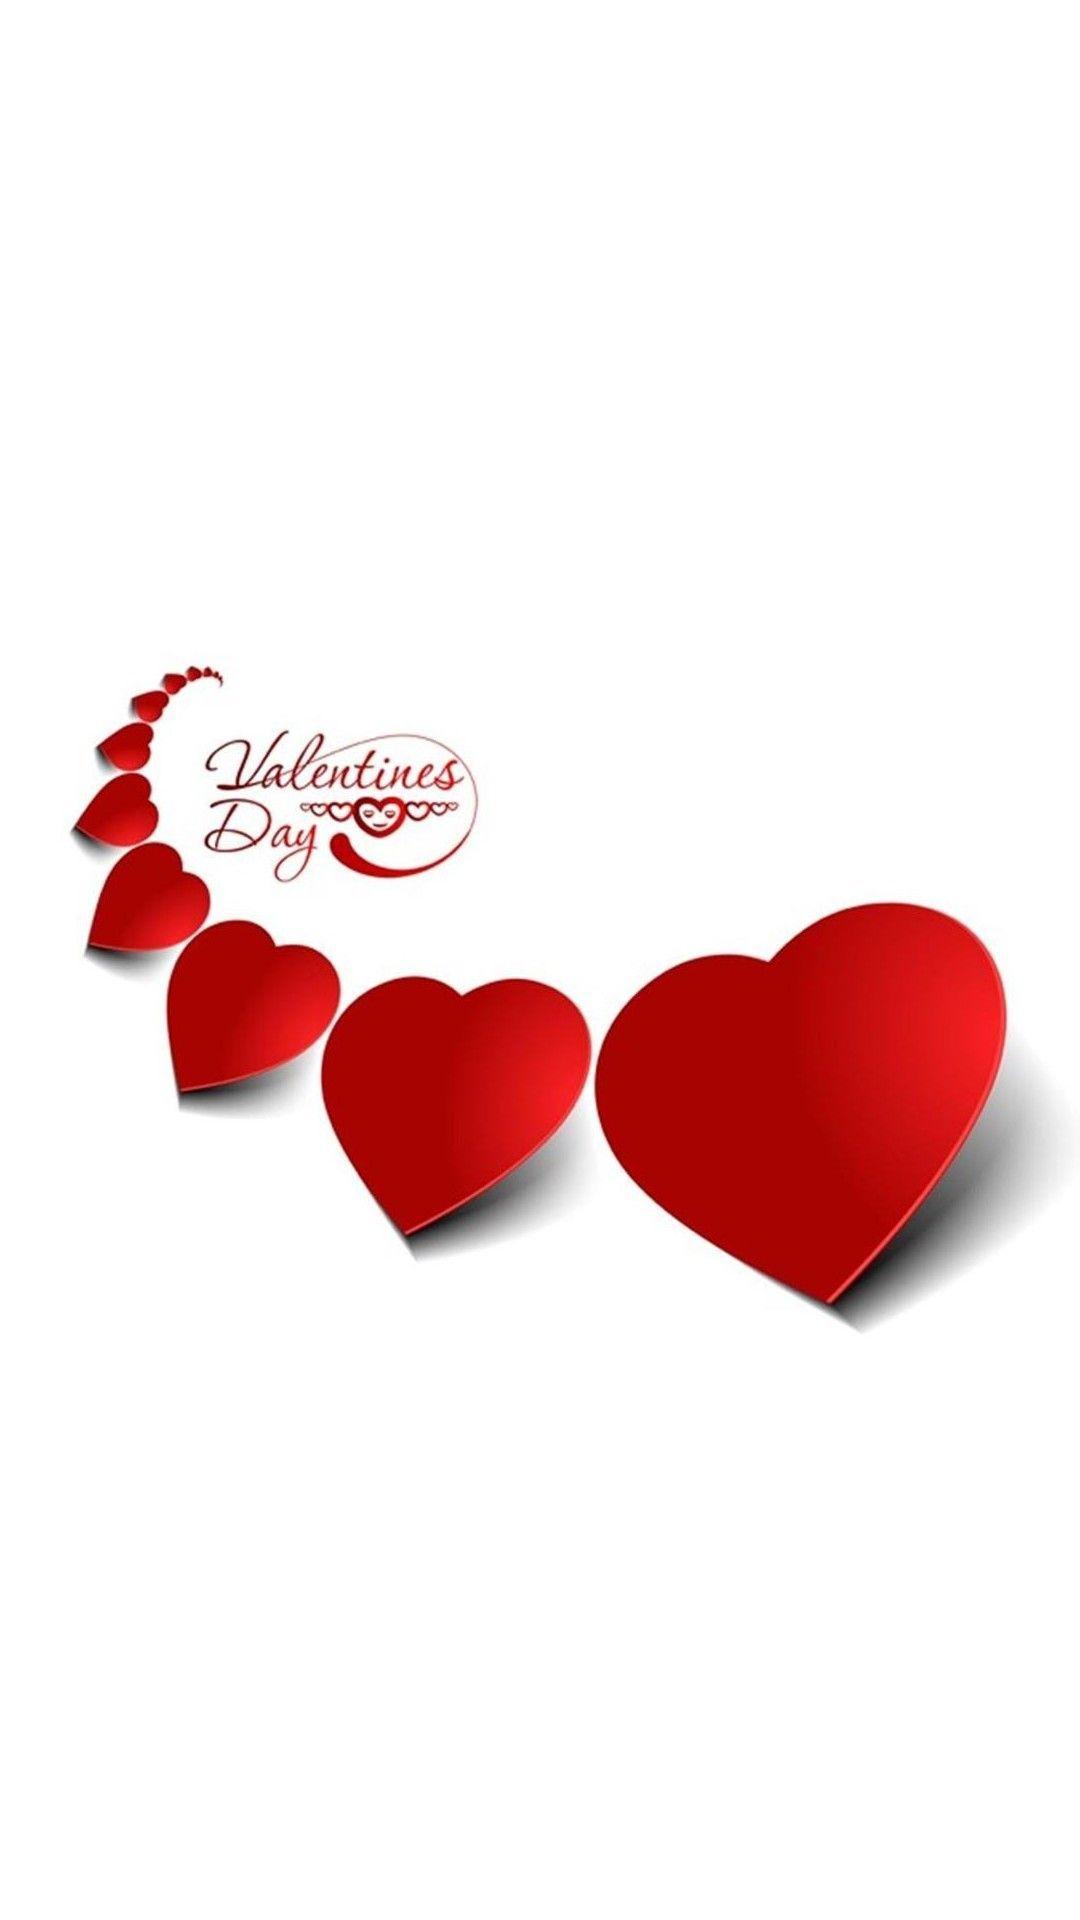 Valentine's Day iPhone 5 wallpaper